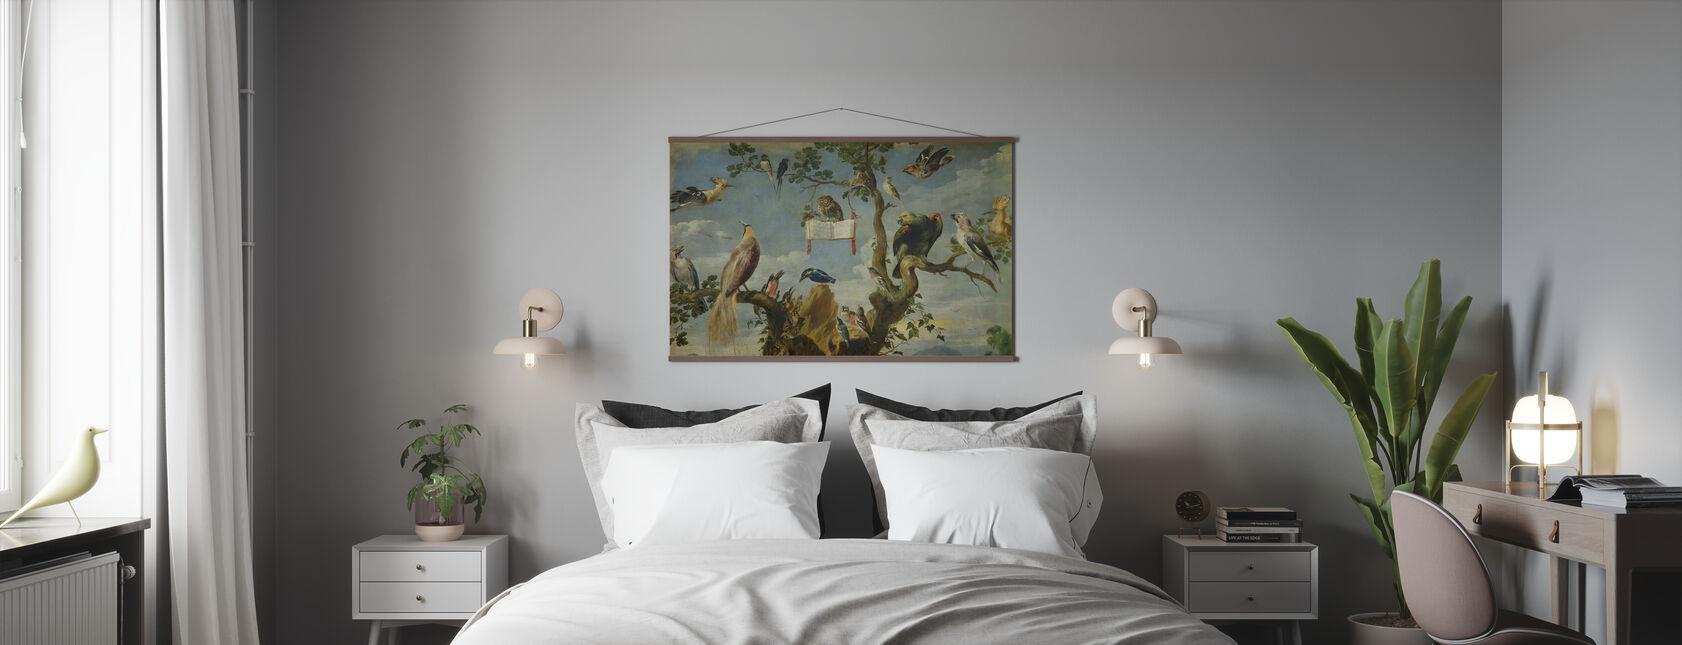 Concert of the Birds - Frans Snyders - Poster - Bedroom